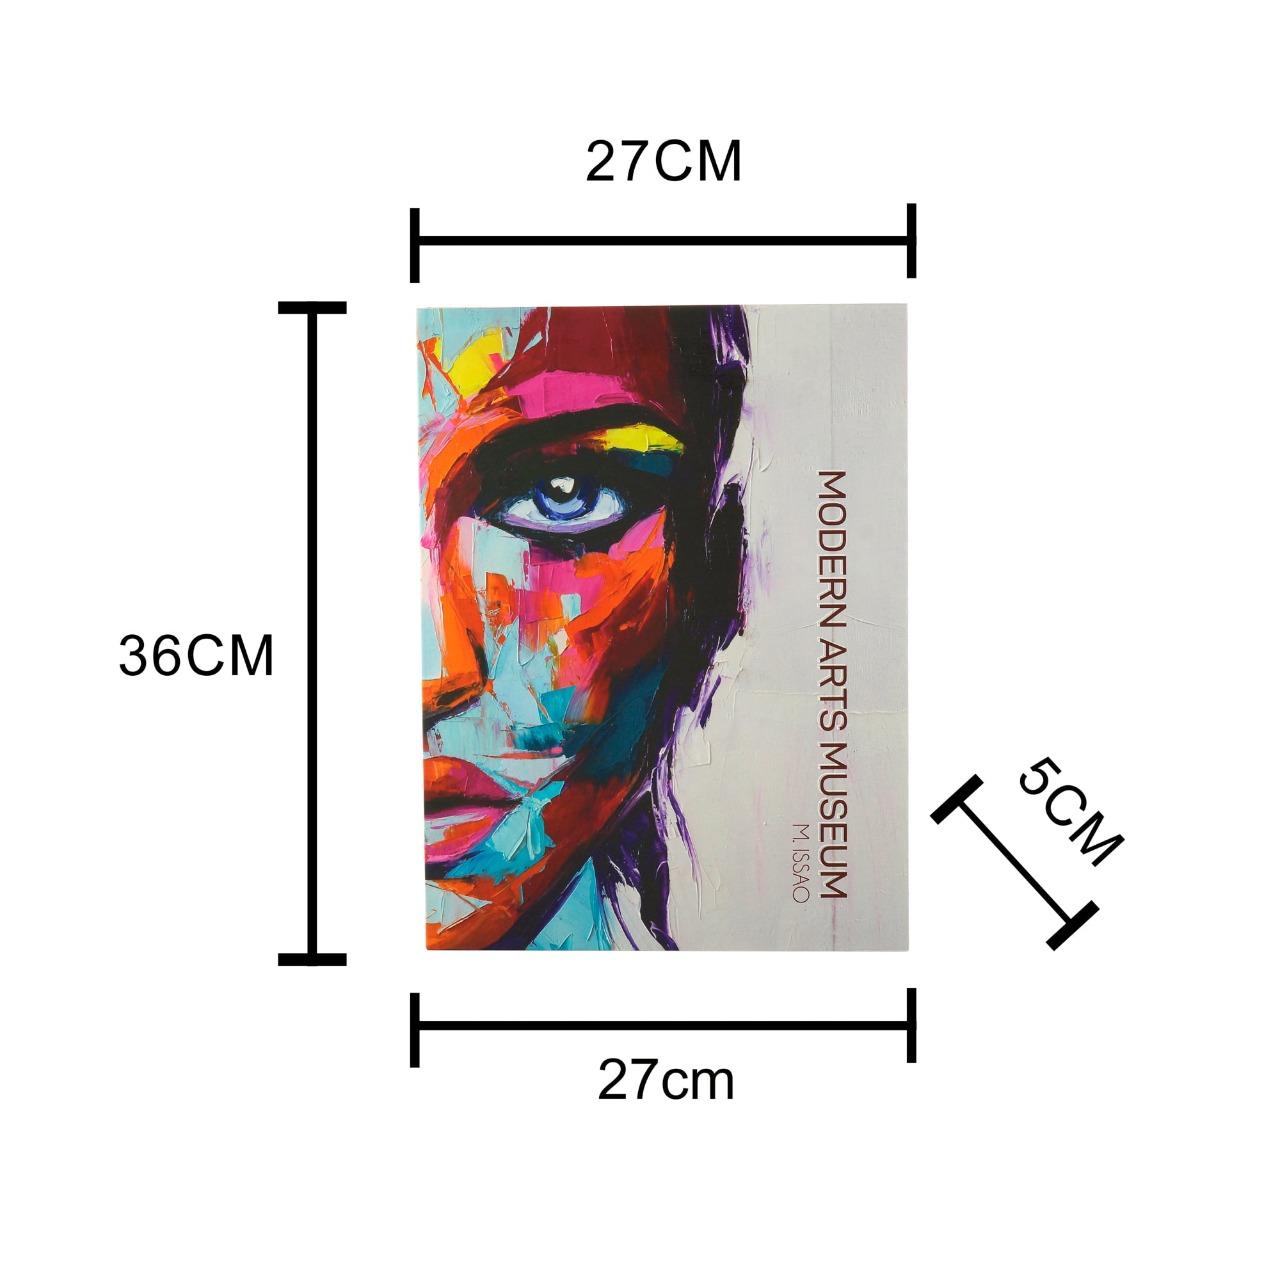 CAIXA 61222 LIVRO MODERN ARTS PAPEL RIG 36X27X5CM